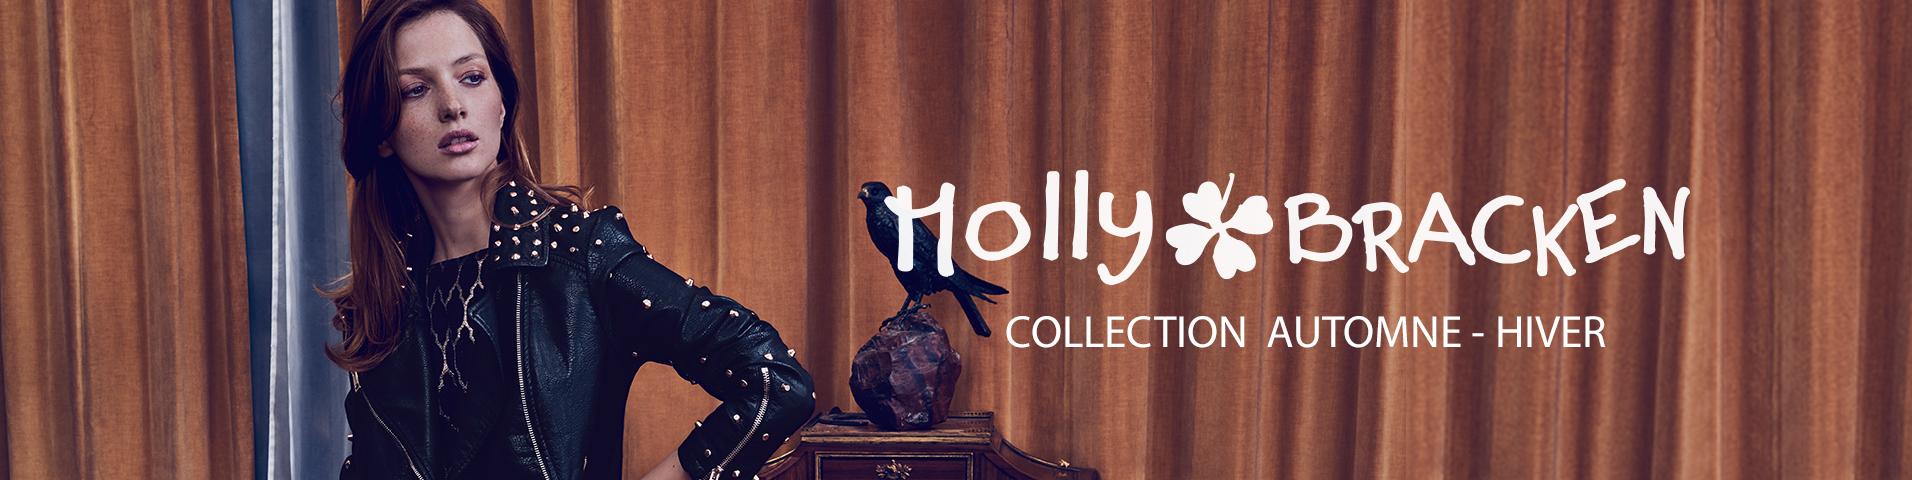 molly bracken kleider online shoppen zalando. Black Bedroom Furniture Sets. Home Design Ideas